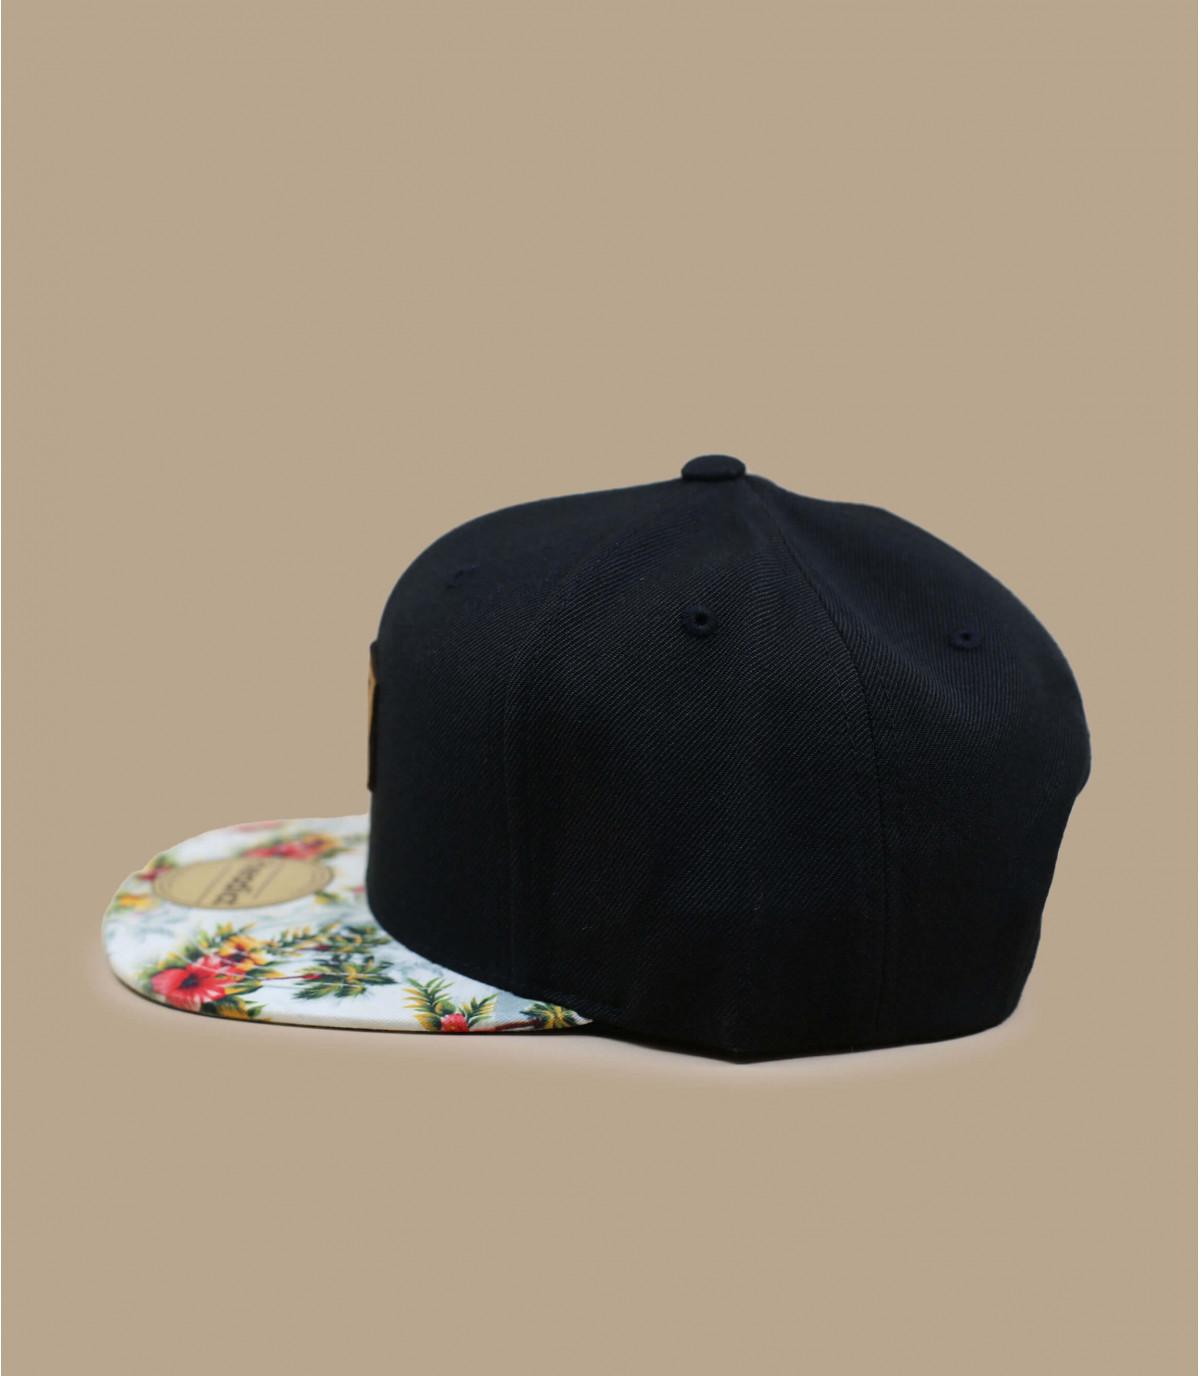 Details Snapback Let's Drive black floral - Abbildung 3